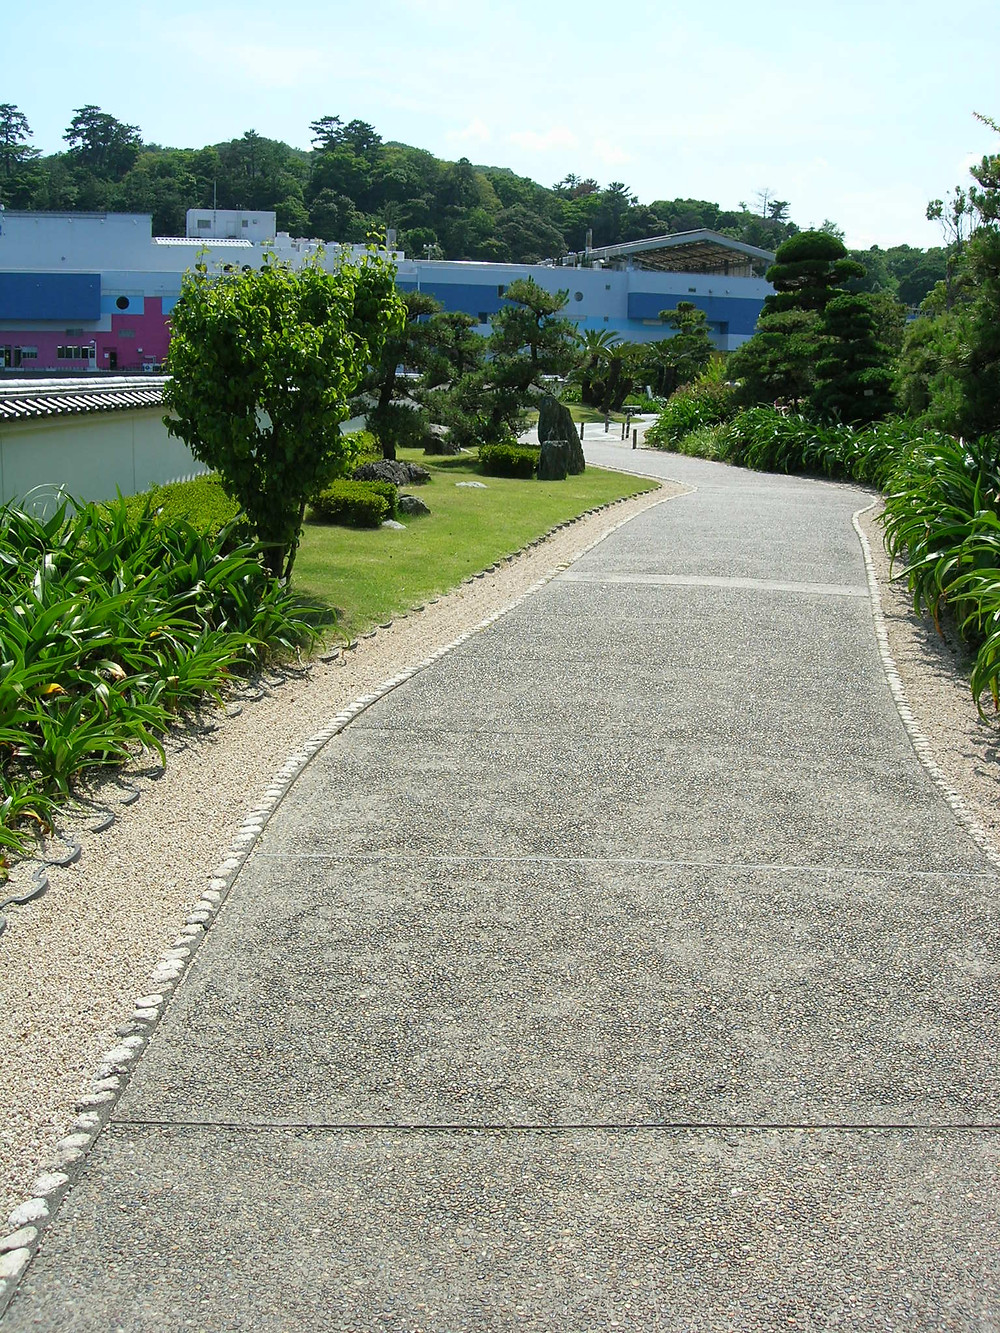 Mikimoto Pearl Factory, Toba, Japan